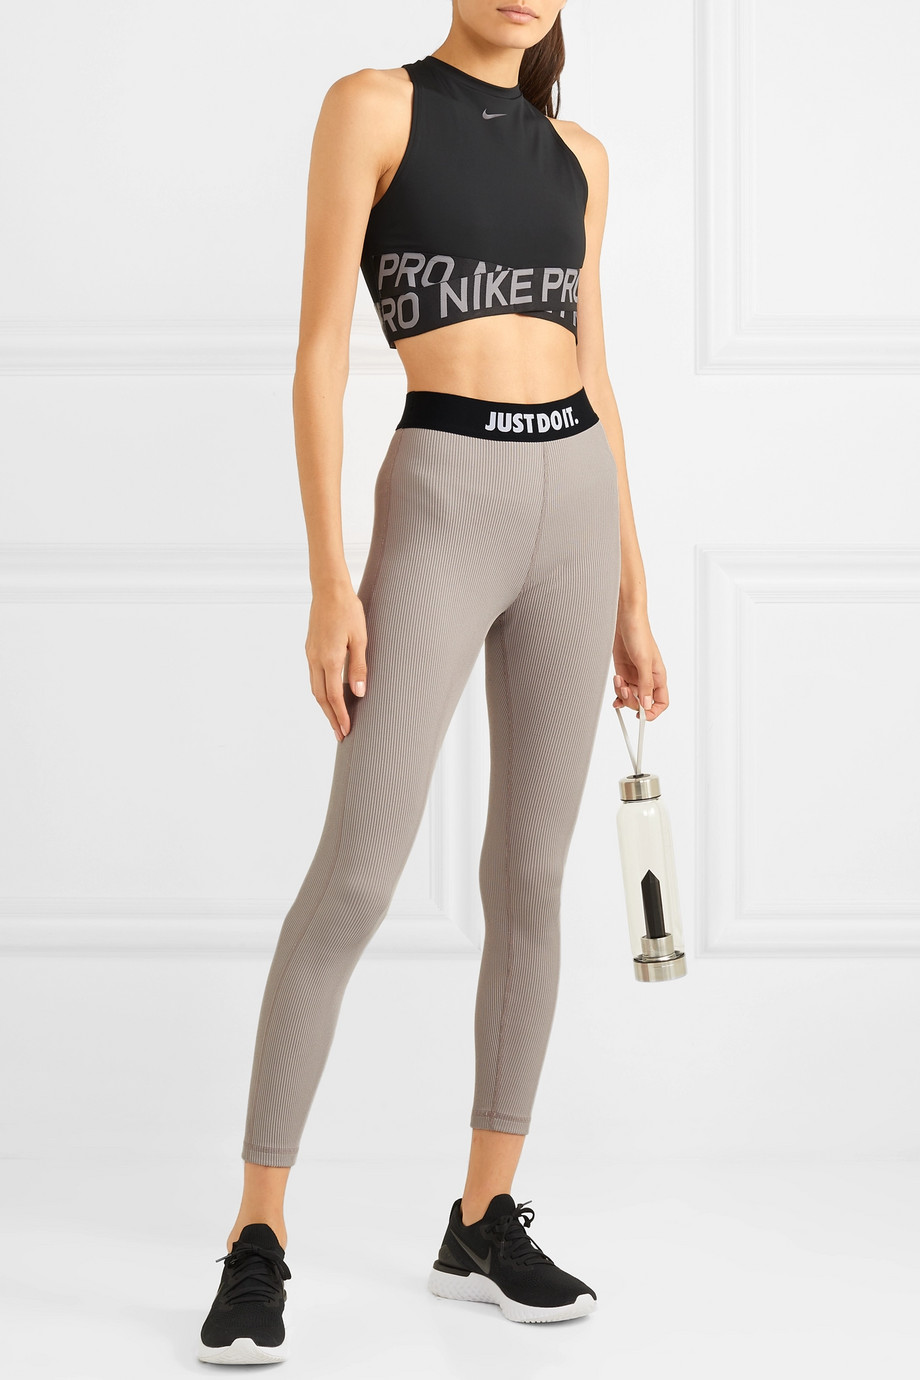 Nike Ribbed stretch leggings